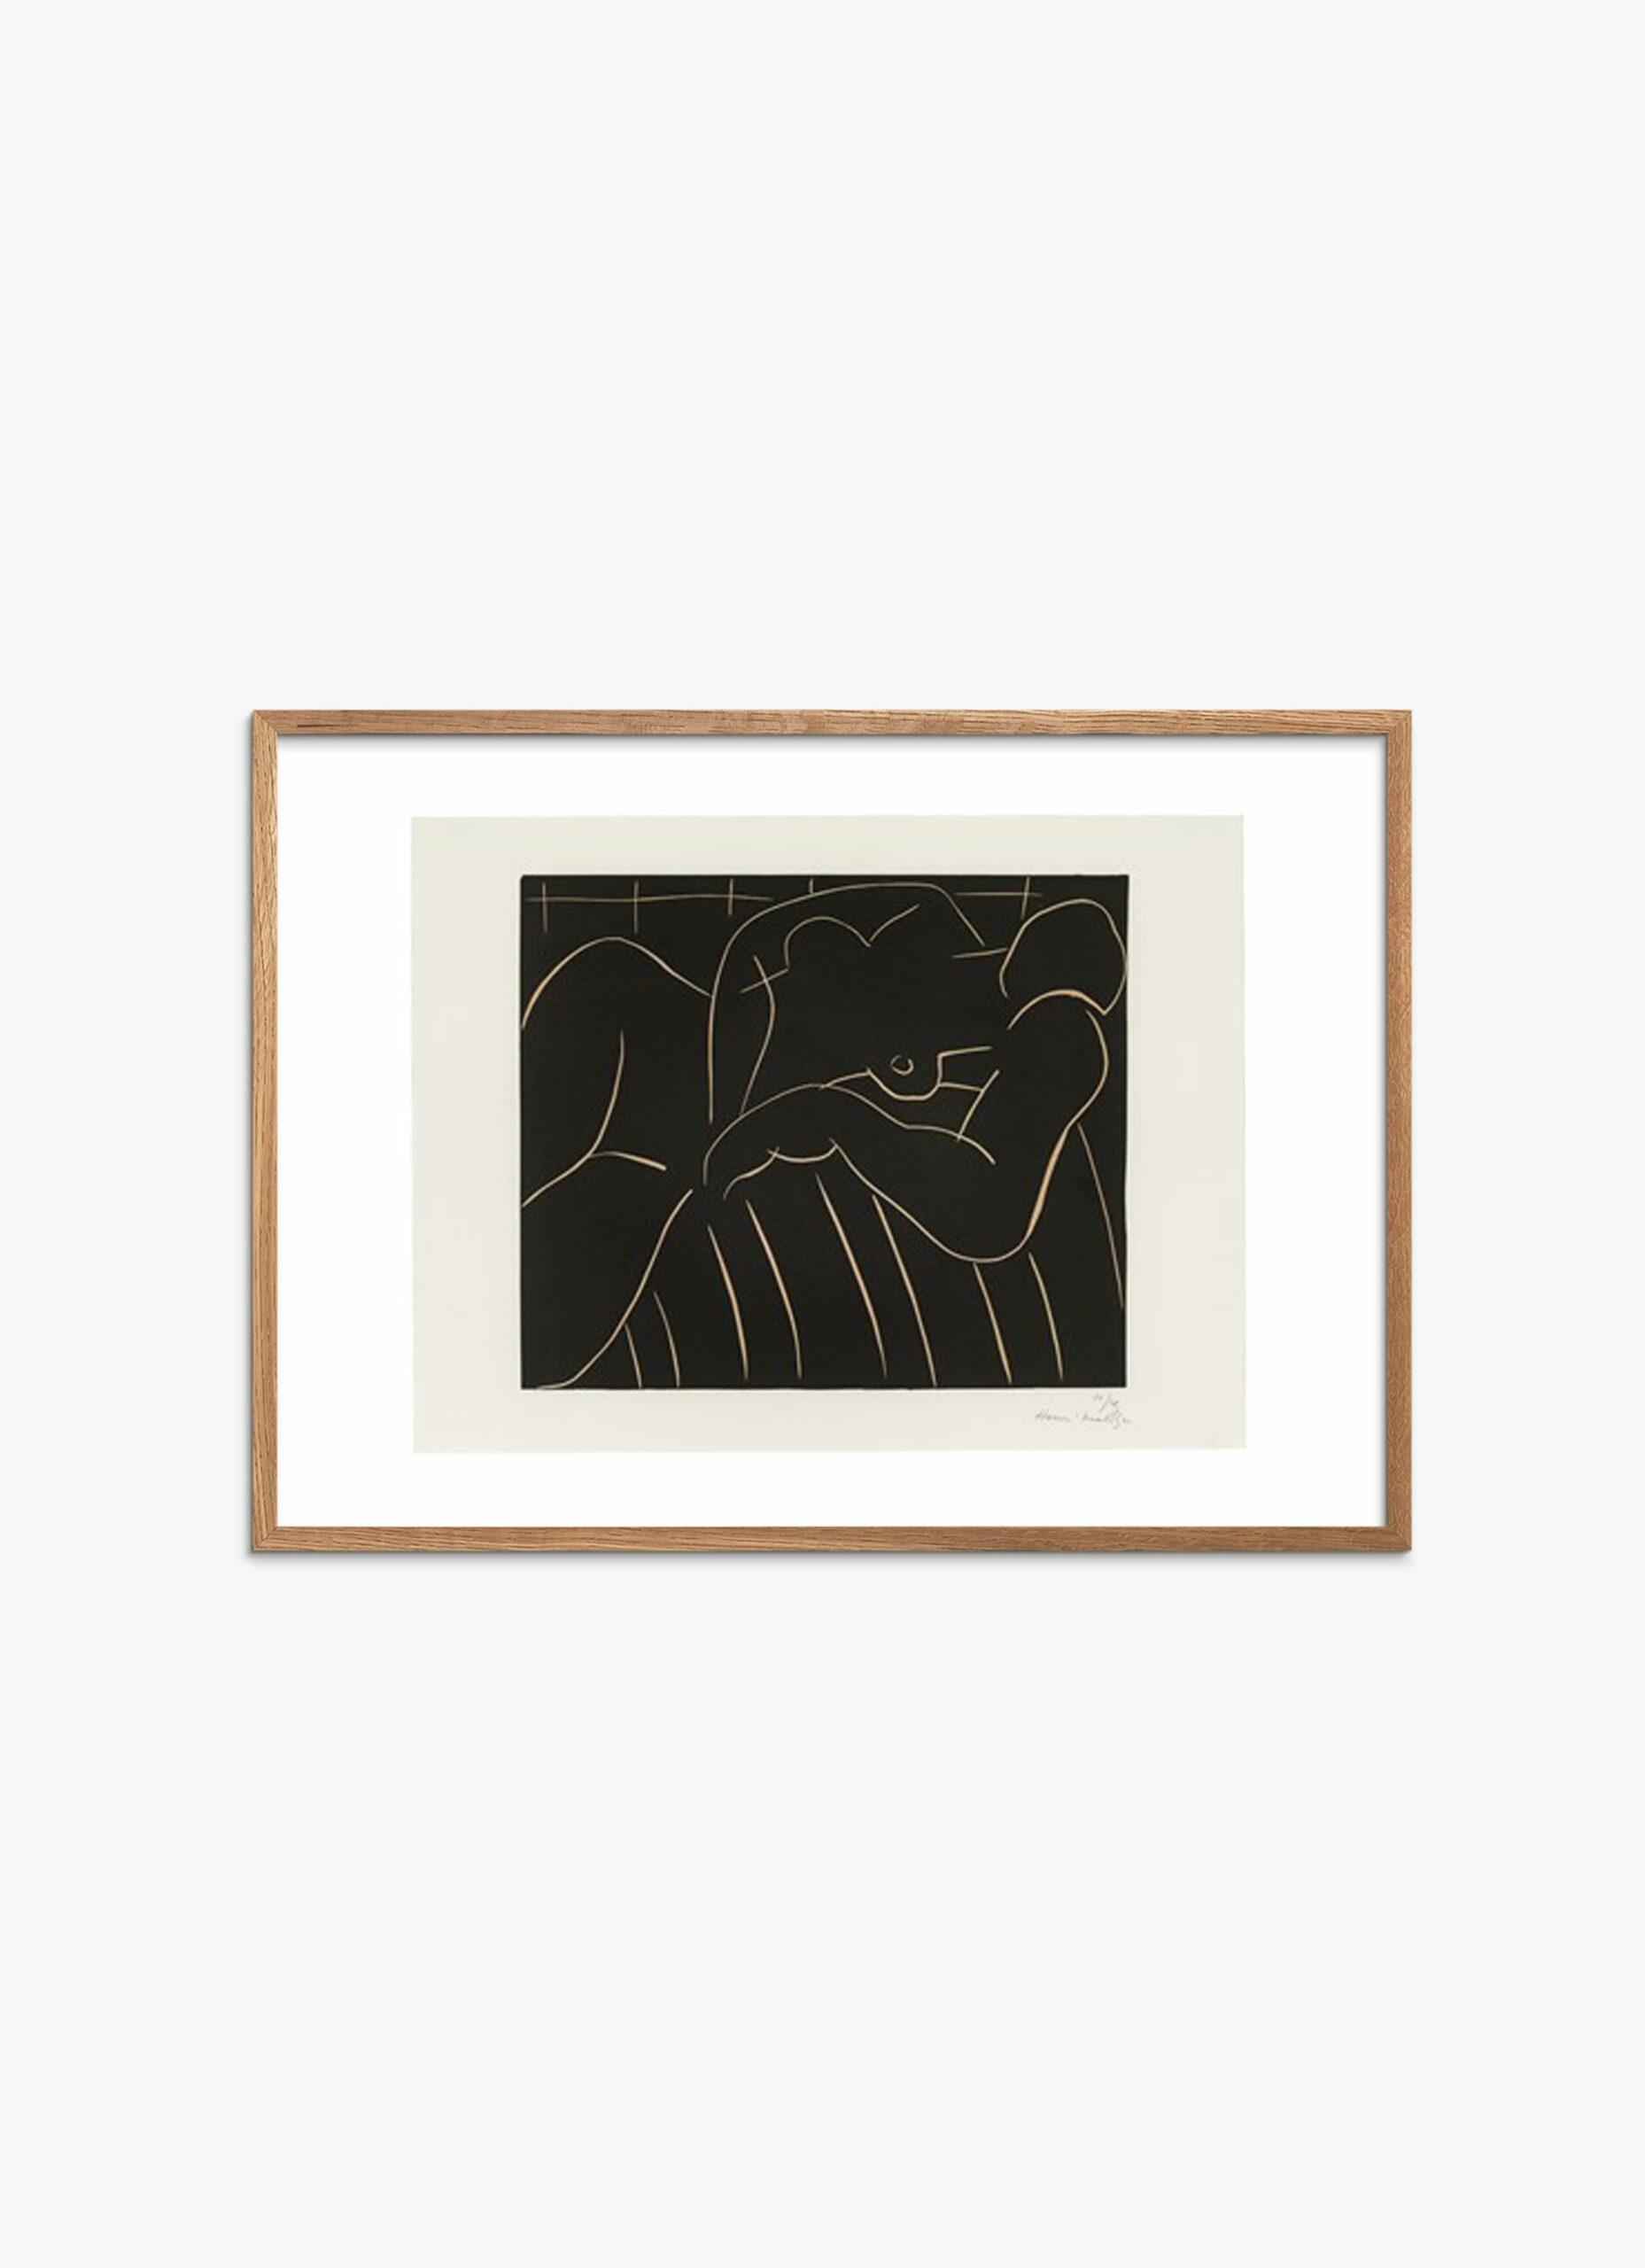 Matisse - Art Print - La Sieste - 70x50cm